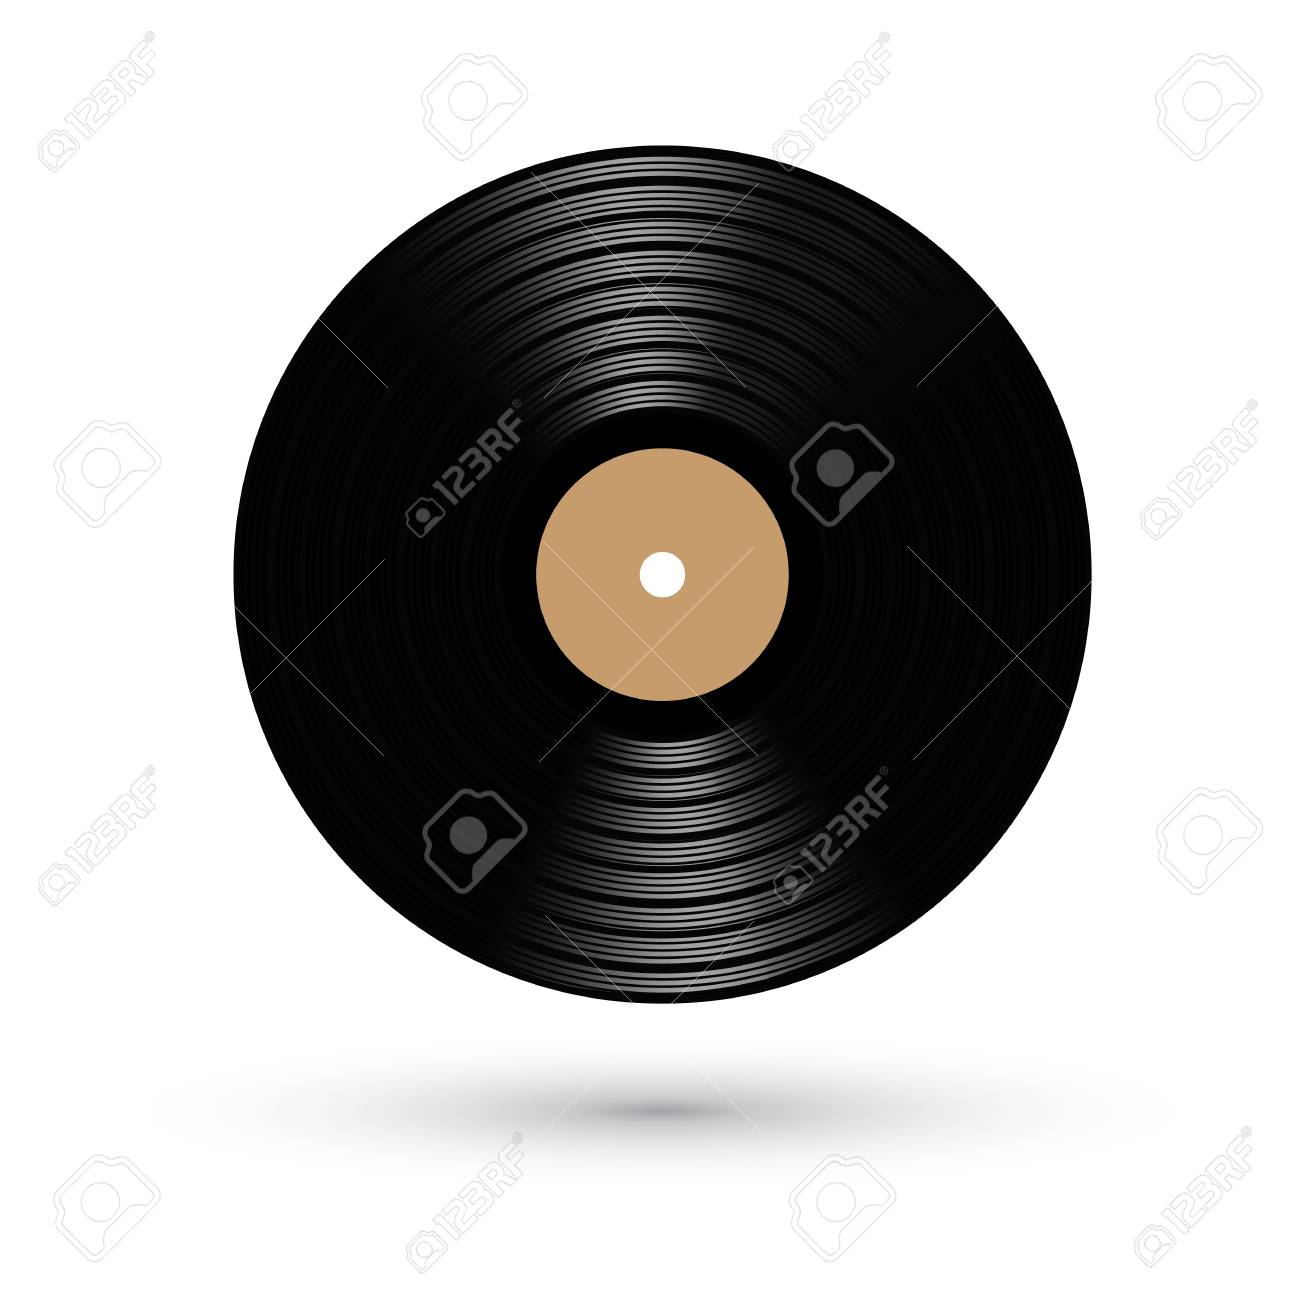 gramophone vinyl lp record with orange label old vintage black royalty free cliparts vectors and stock illustration image 126017489 gramophone vinyl lp record with orange label old vintage black